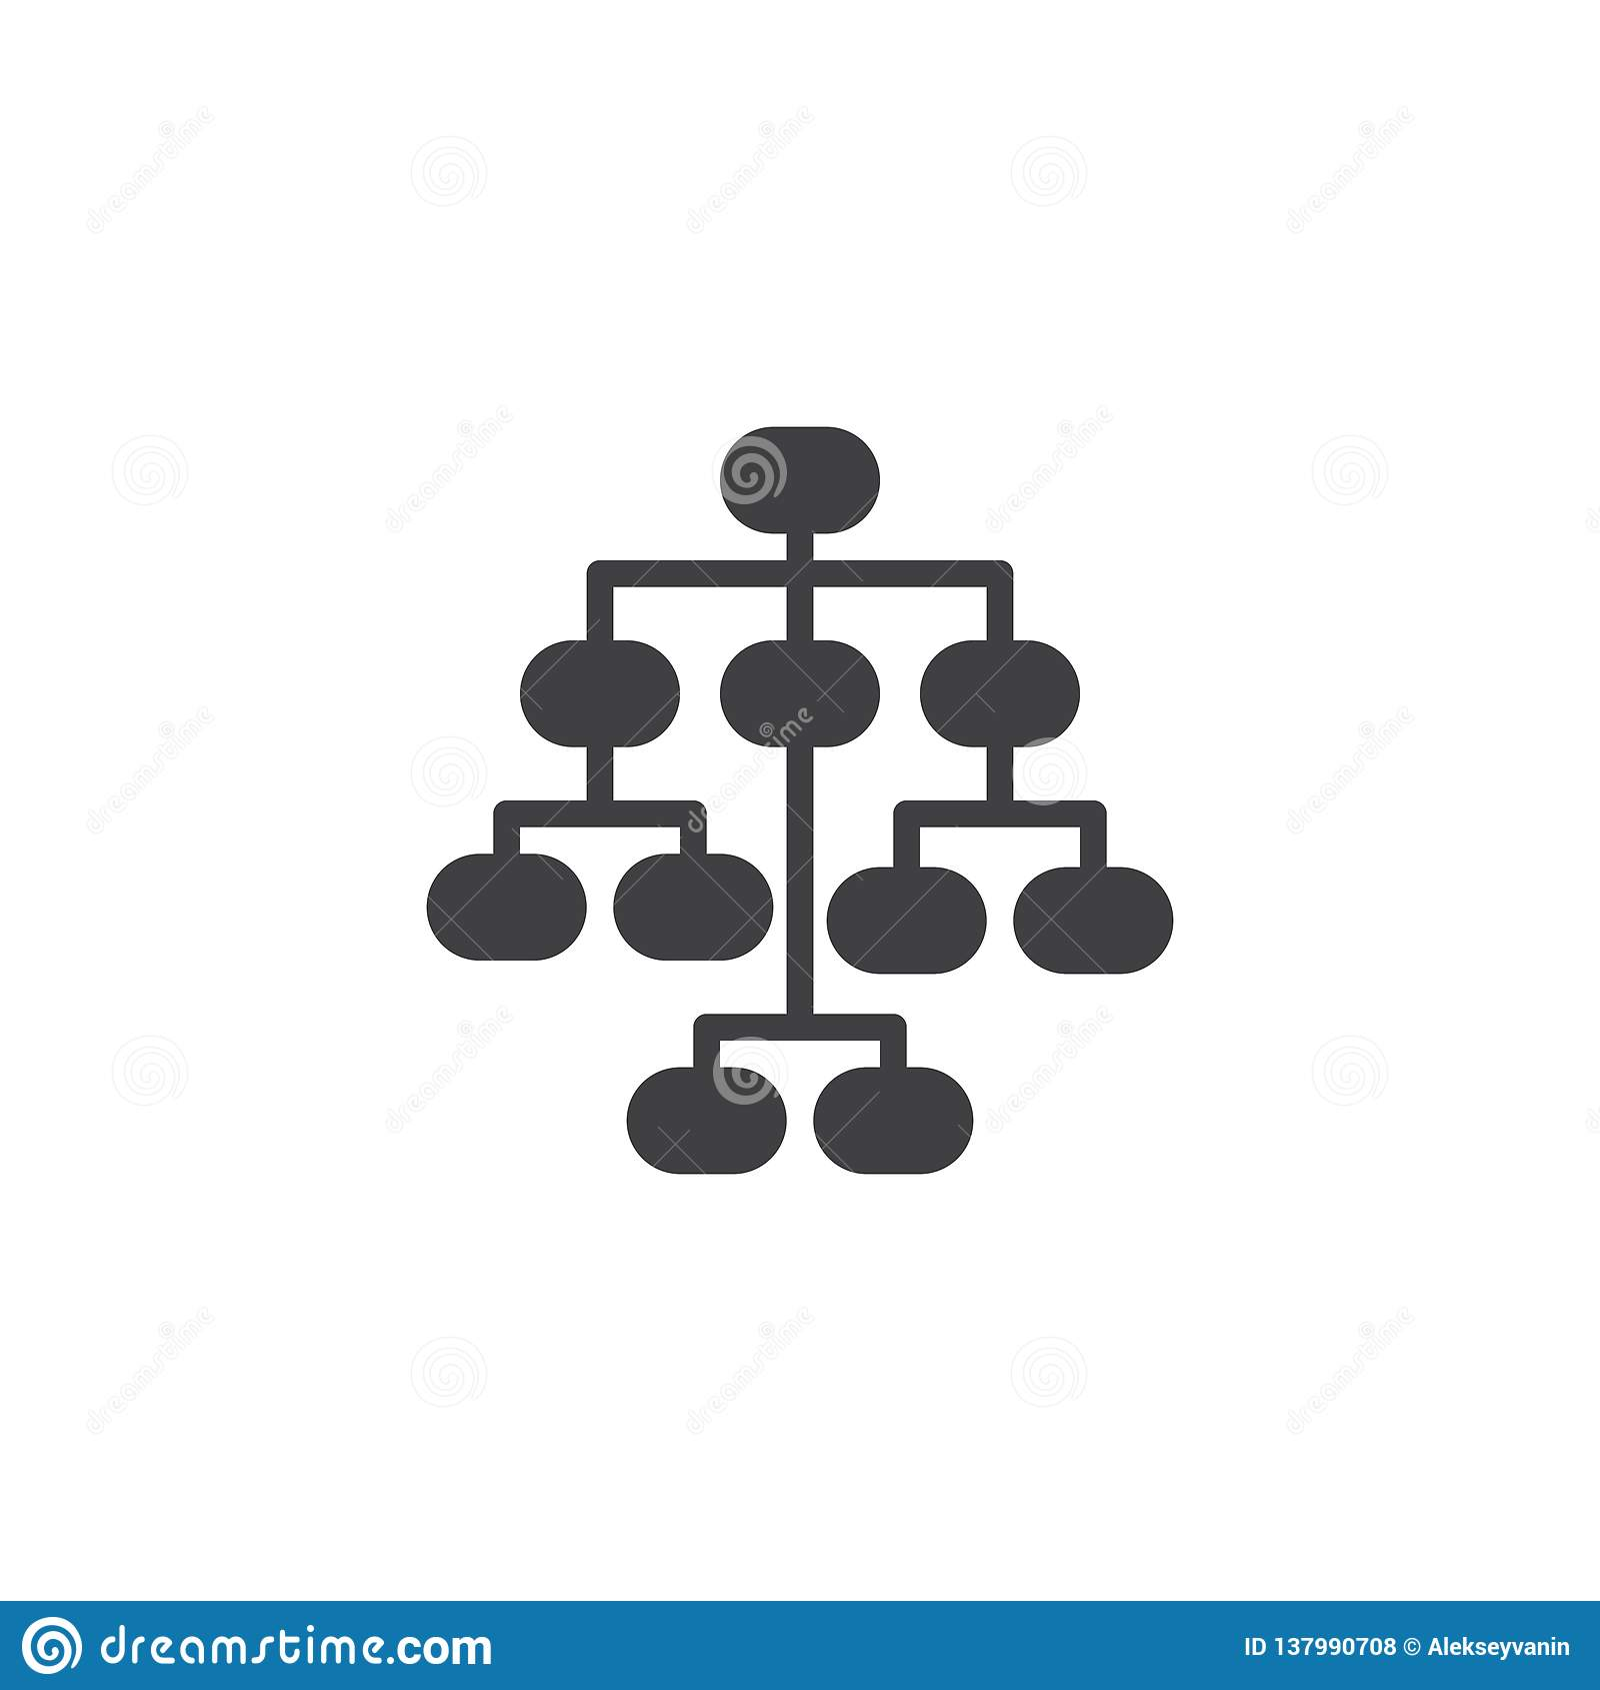 Sitemap vektorsymbol